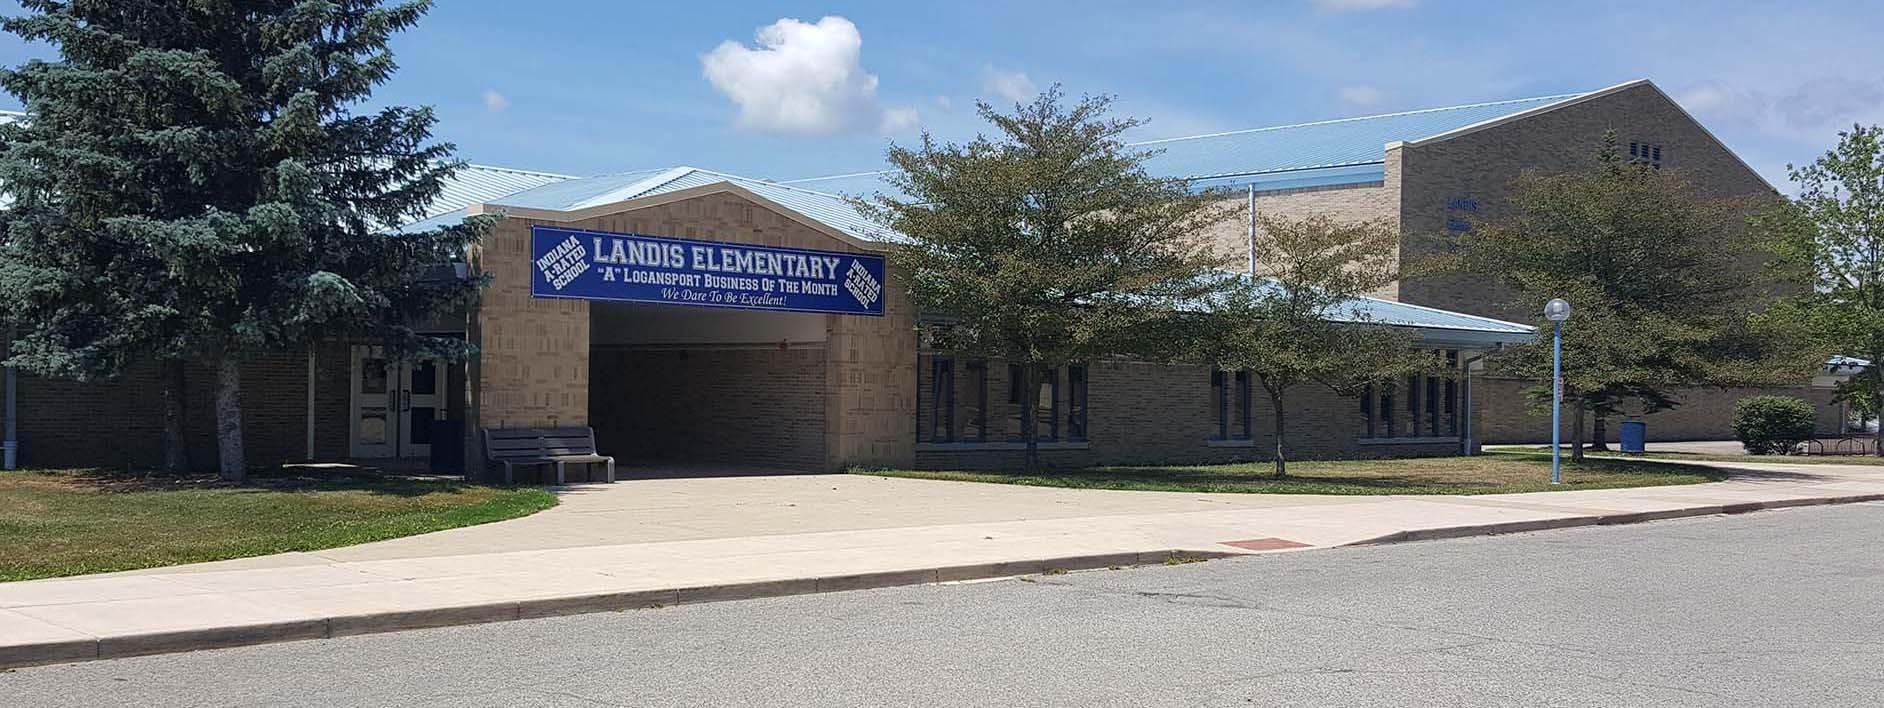 Exterior view of Landis Elementary